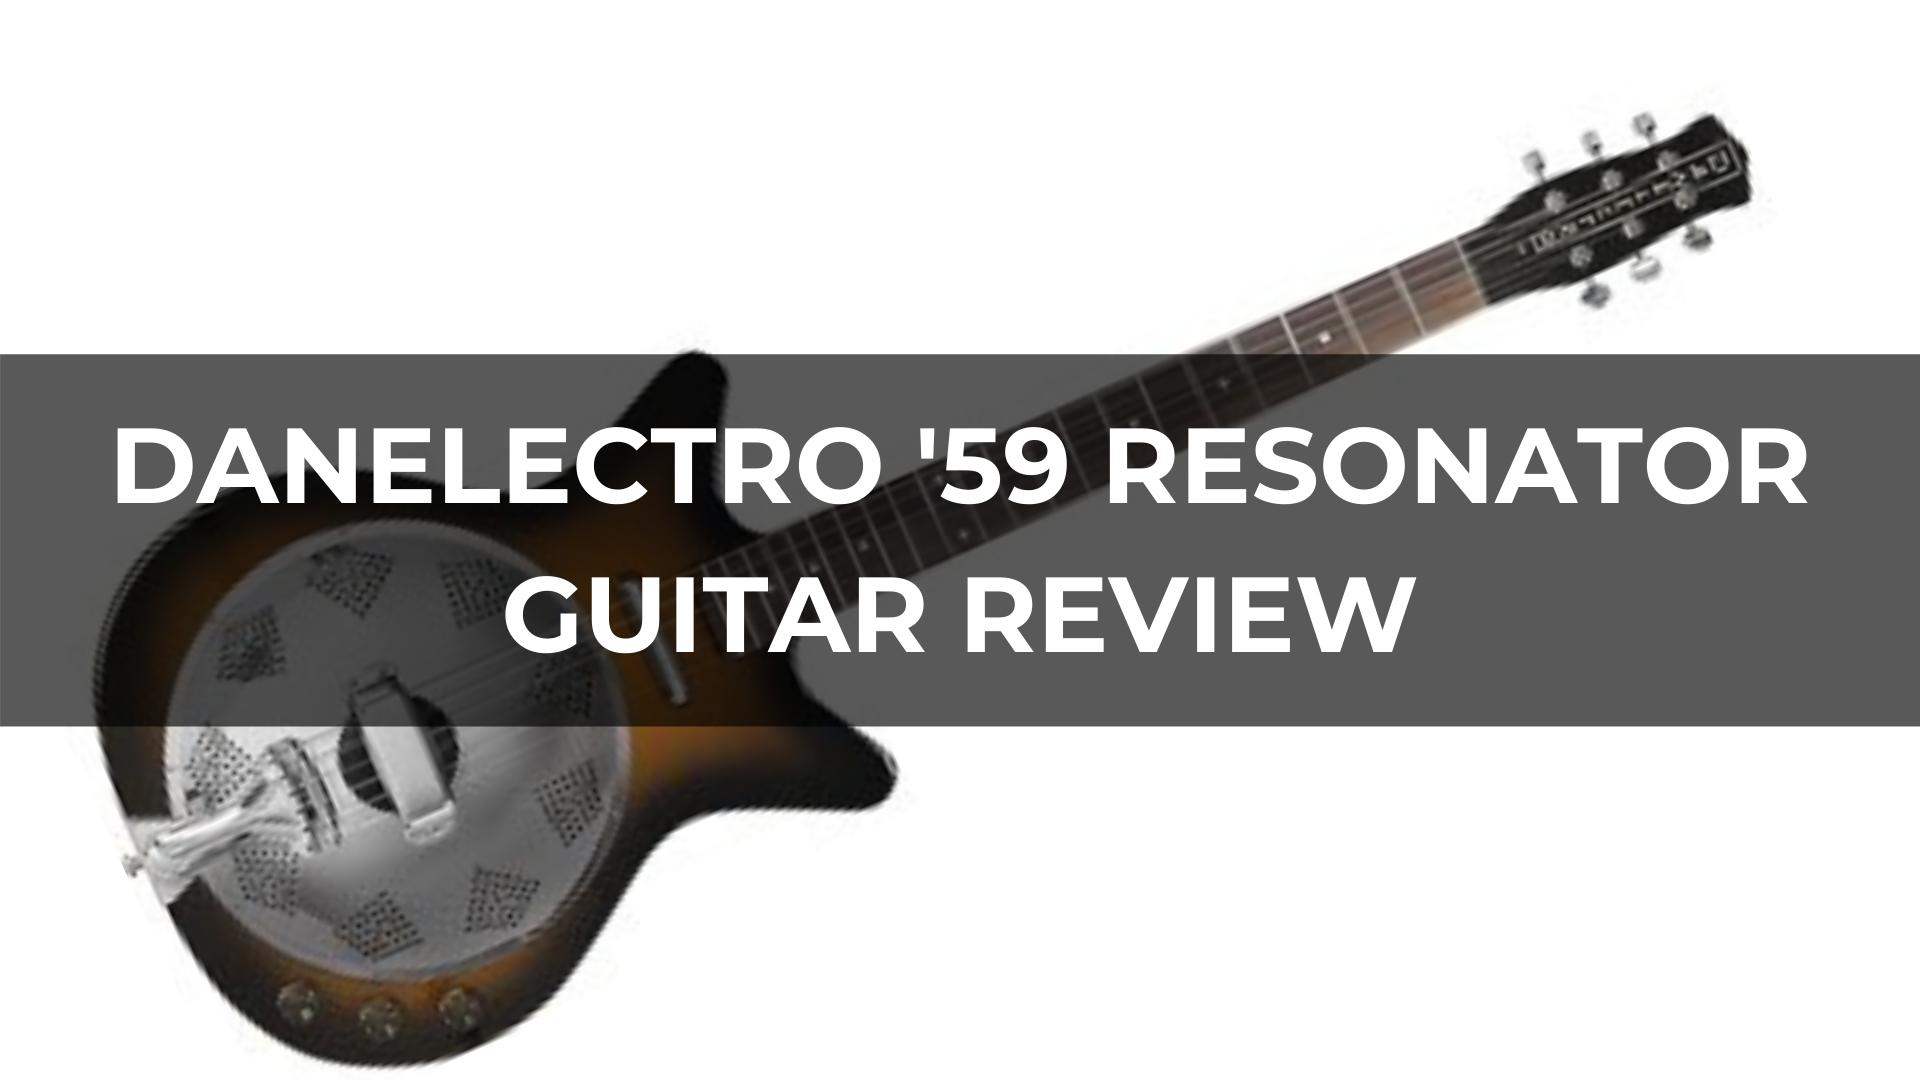 Danelectro '59 Resonator Guitar Review